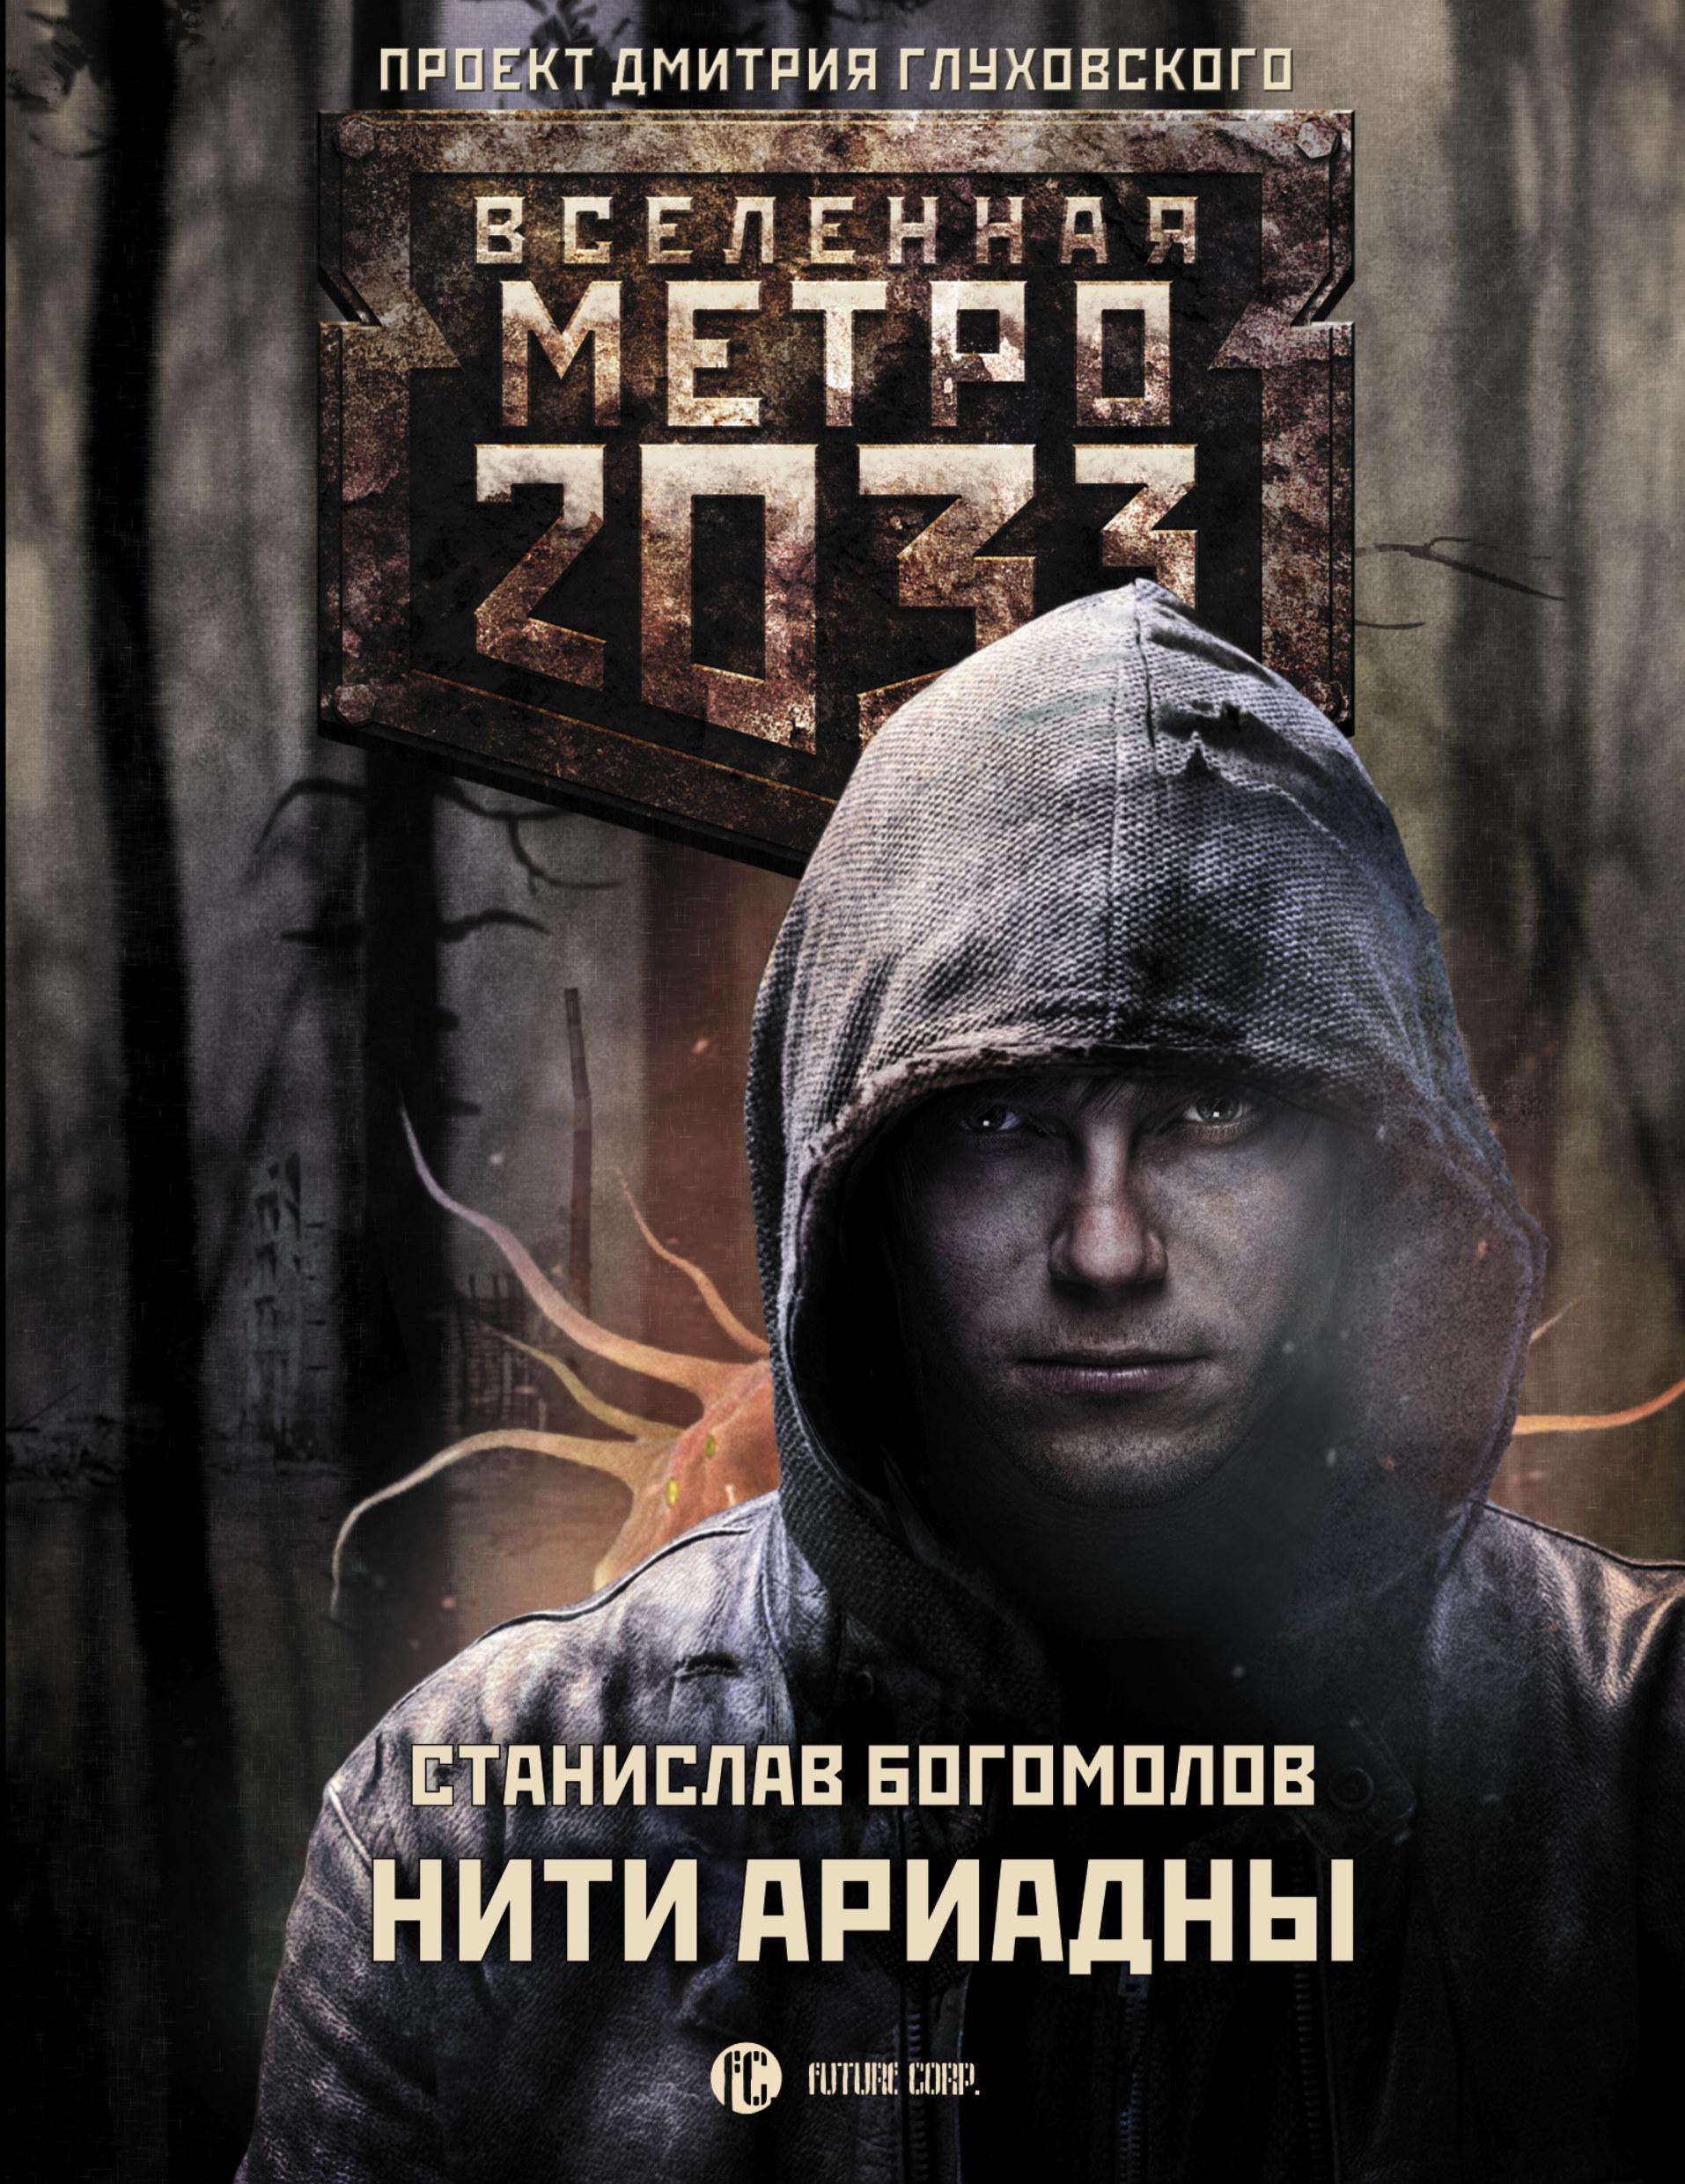 Метро 2033: Нити Ариадны ( Богомолов Станислав  )